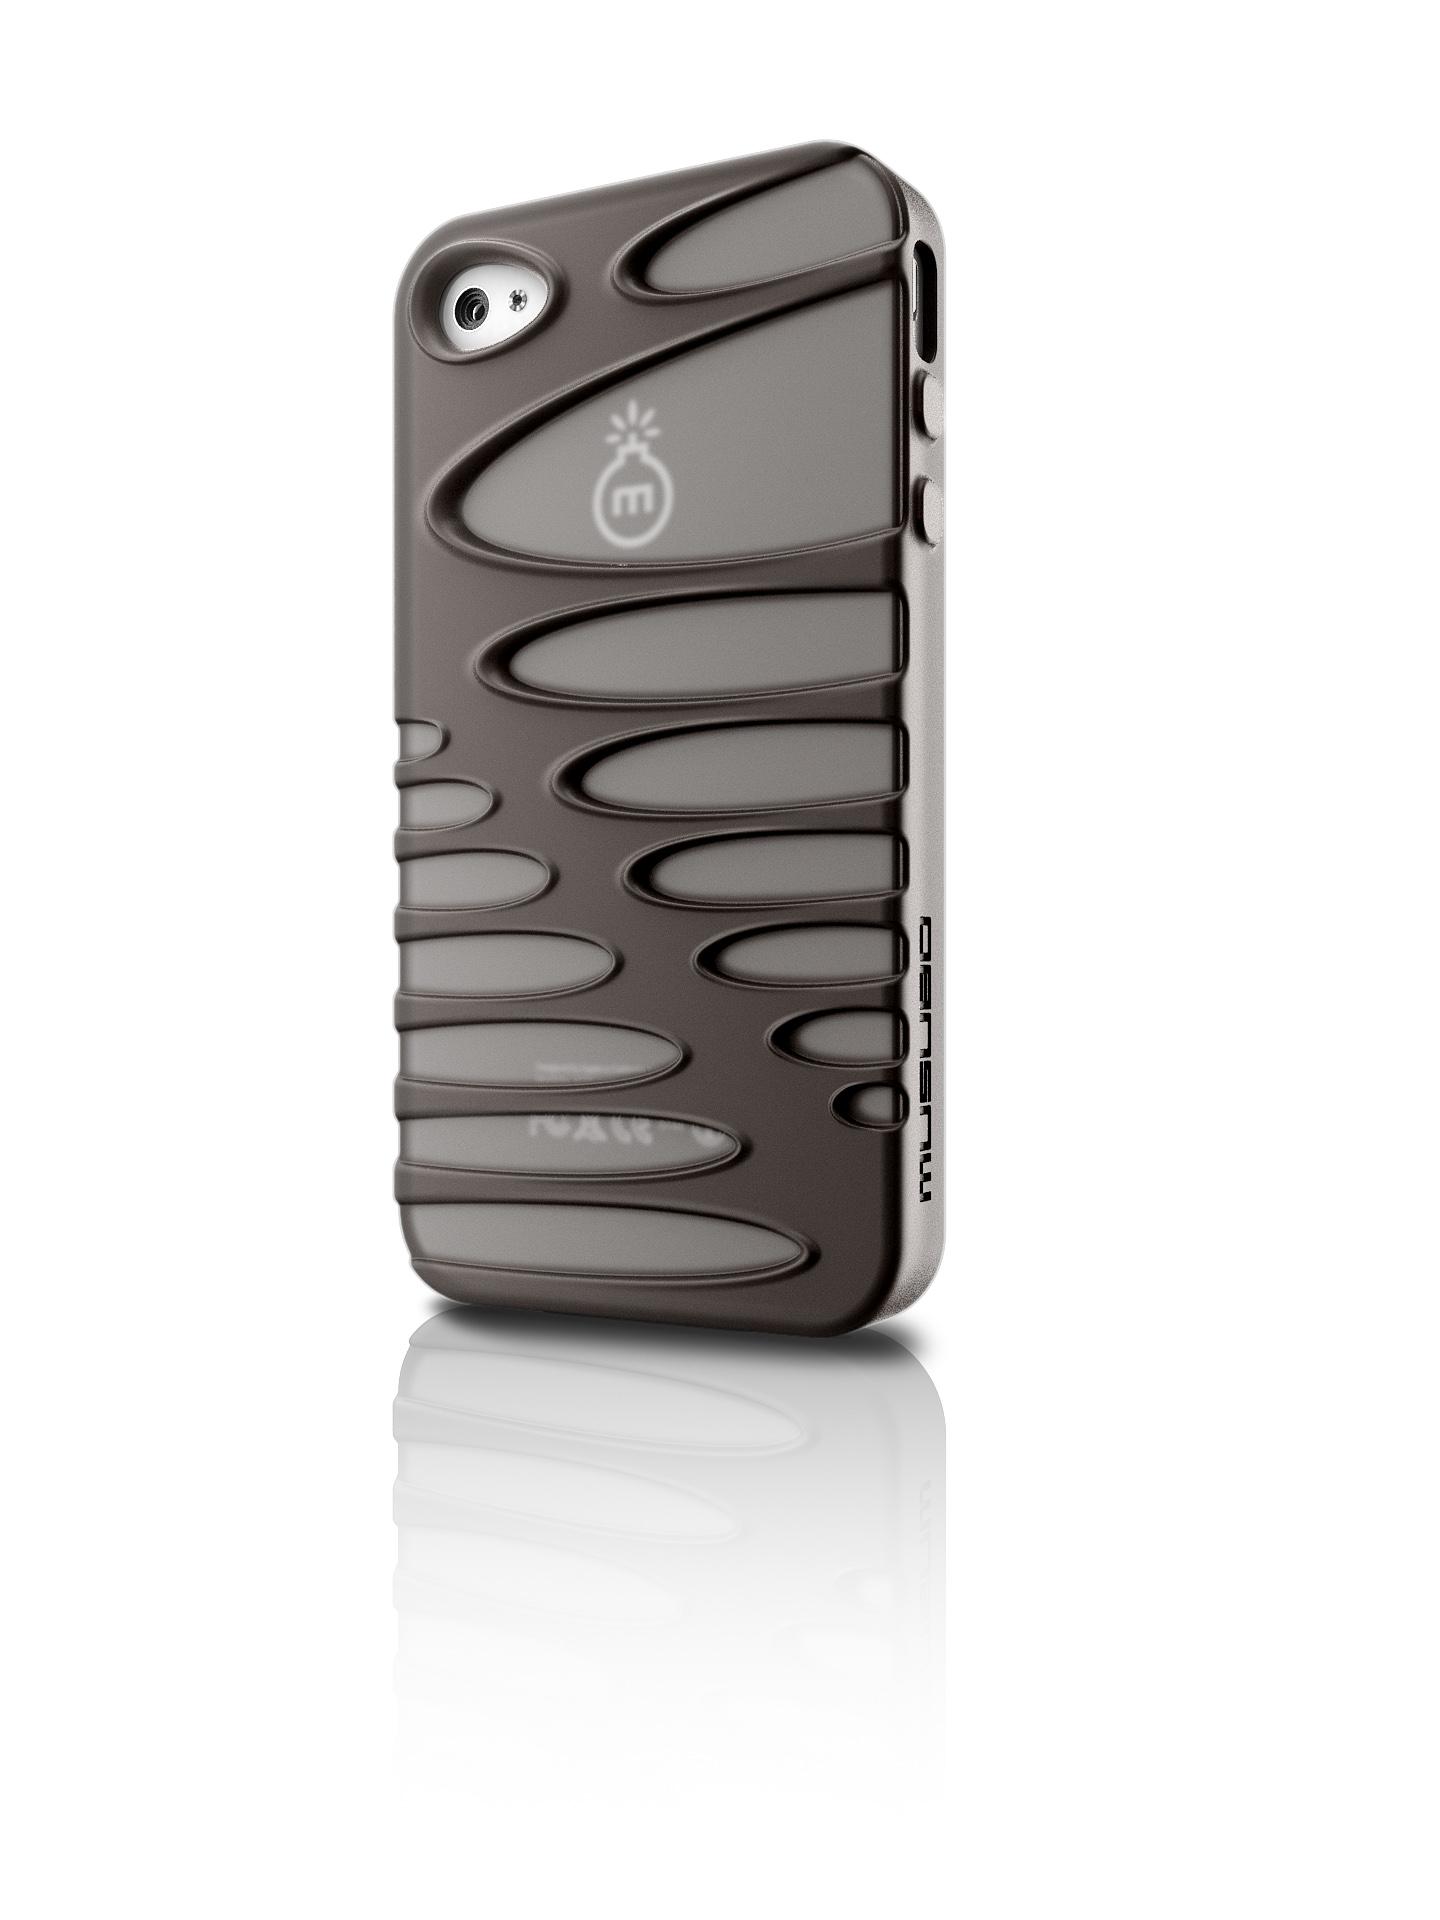 Original Musubo Case Sexy  Iphone 4S/4G Black Retail